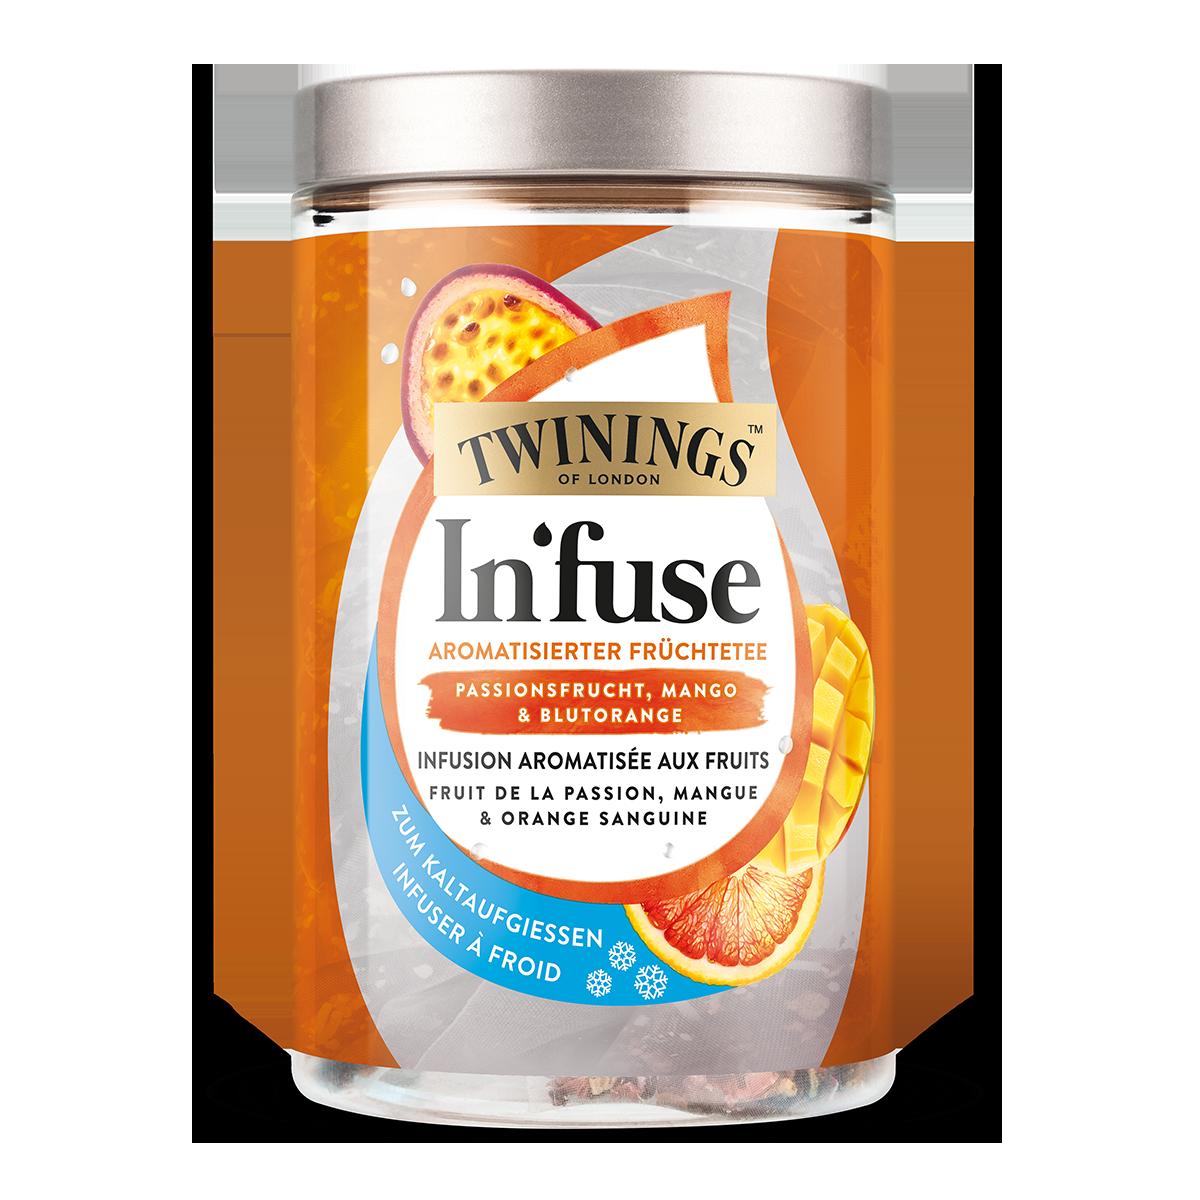 Twinings In'fuse Passionsfrucht, Mango & Blutorange 30 g